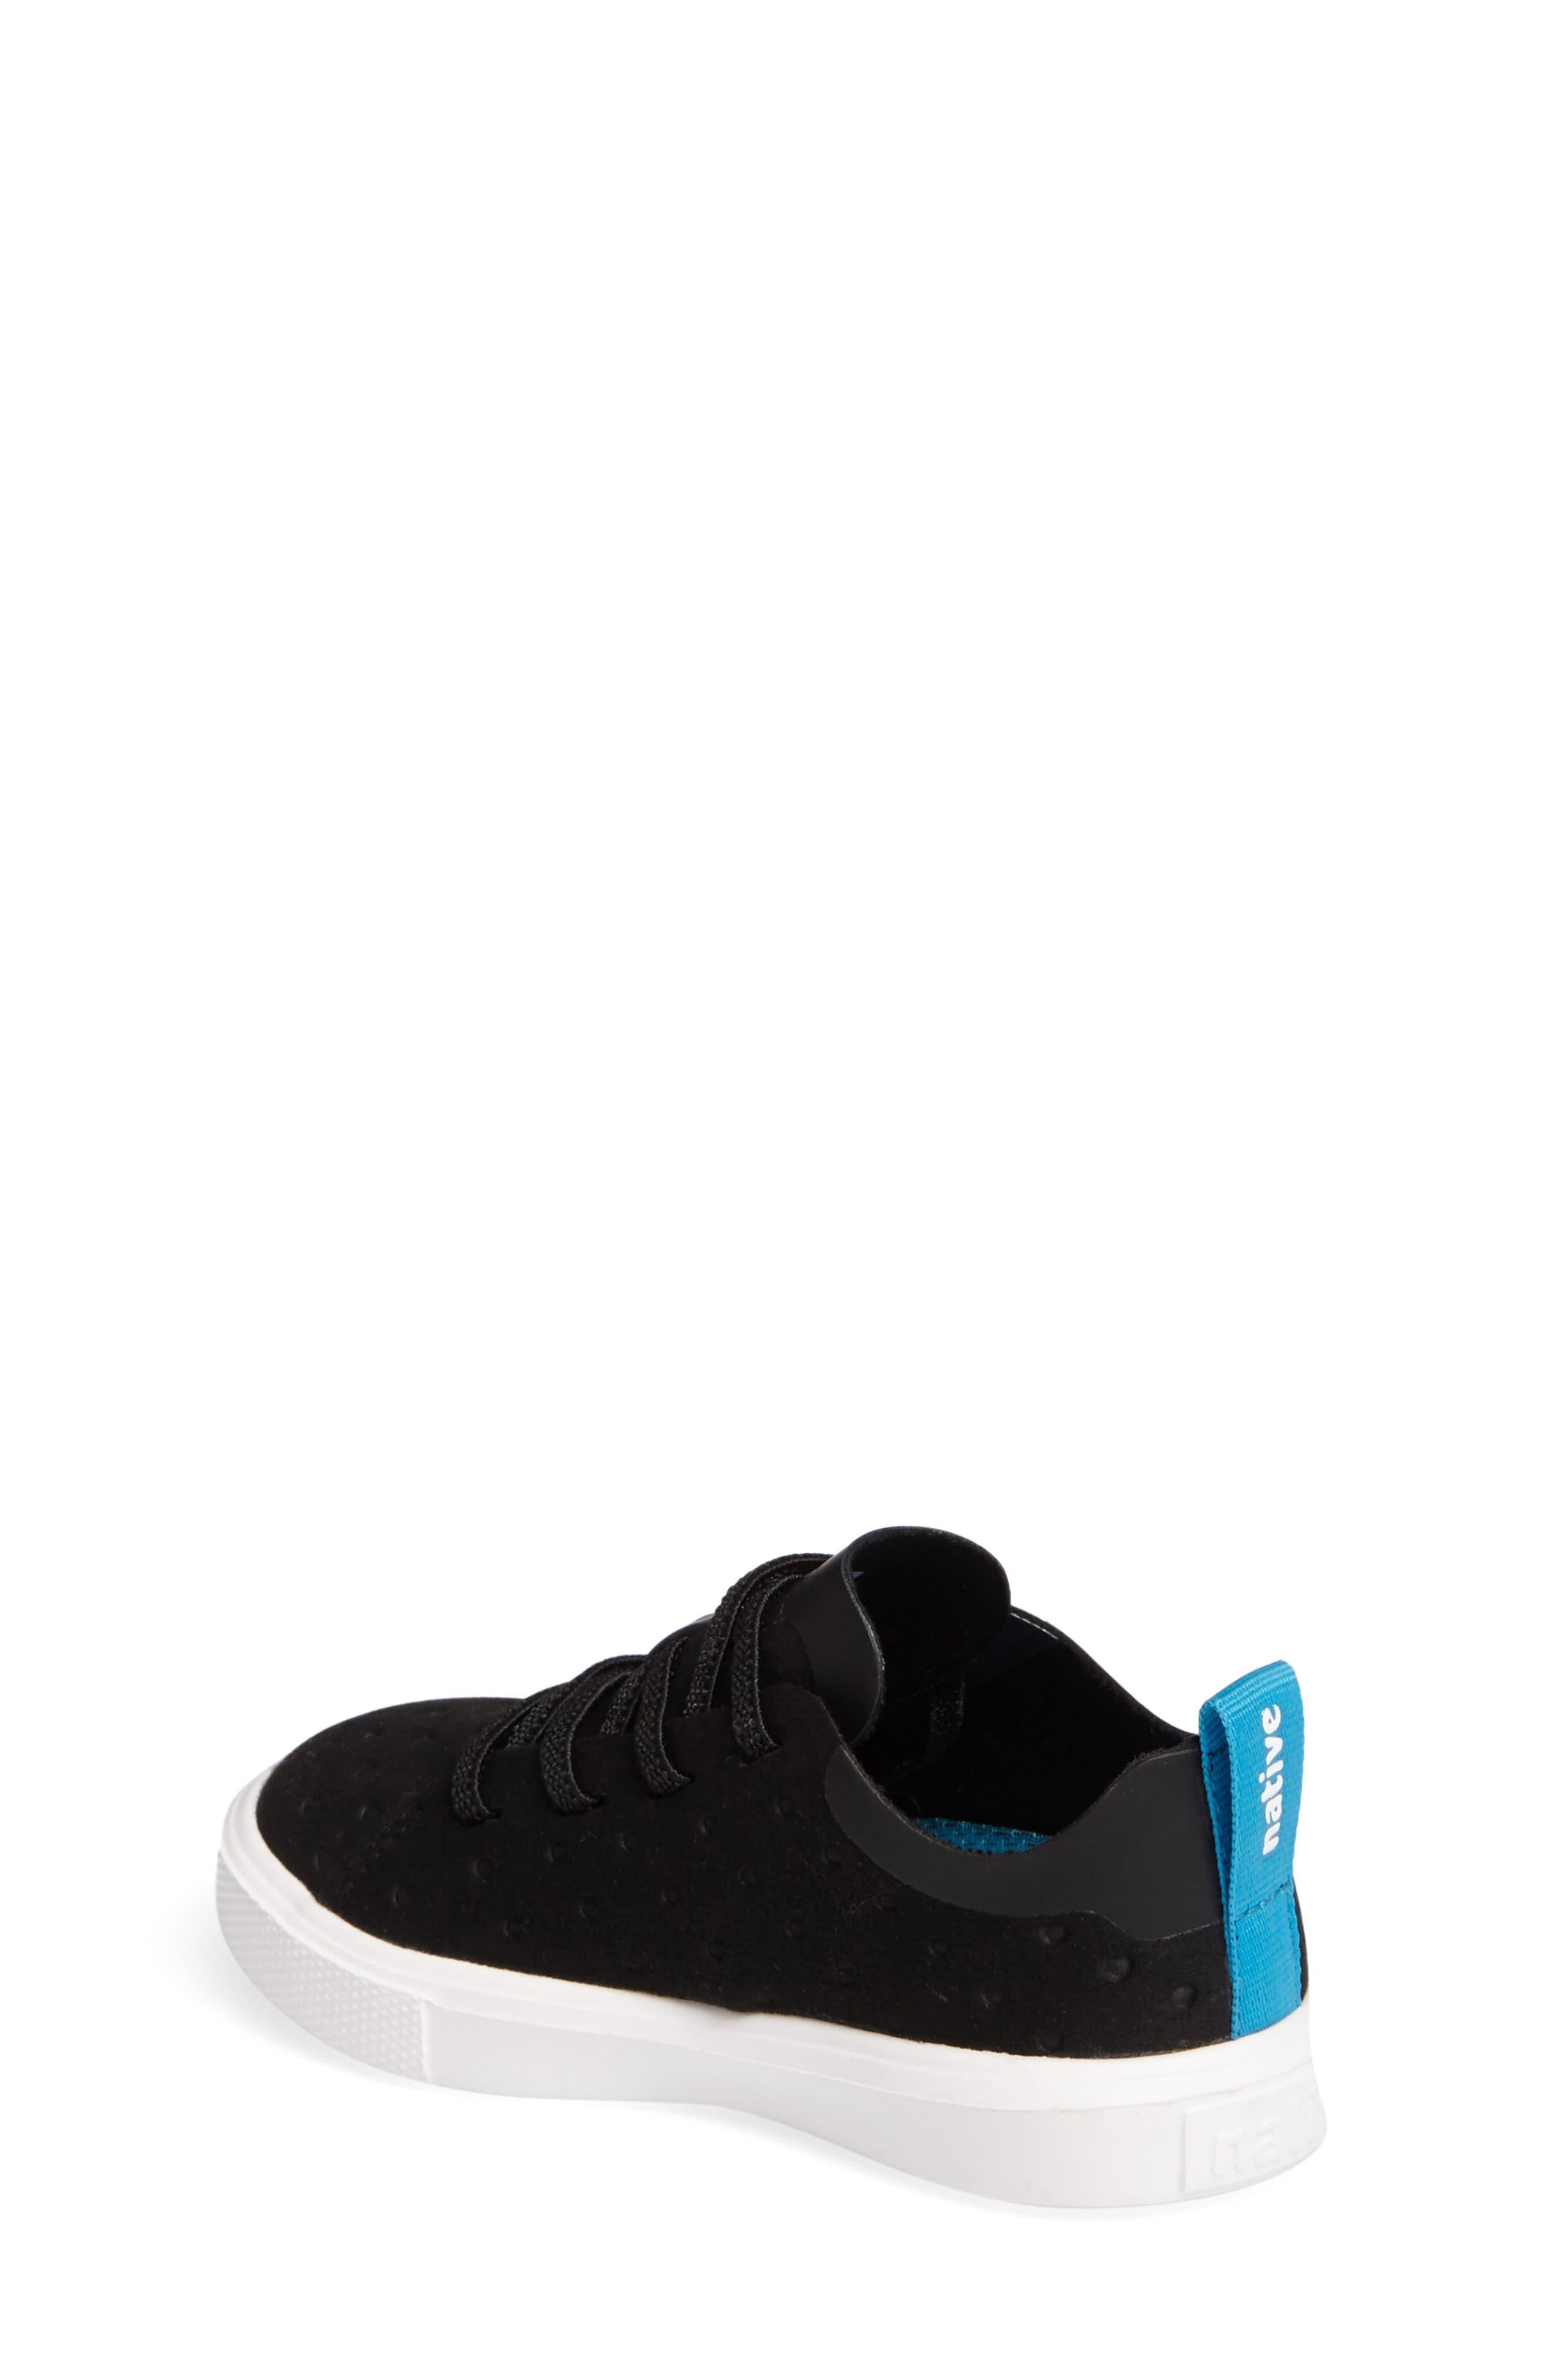 Monaco Sneaker,                             Alternate thumbnail 2, color,                             004